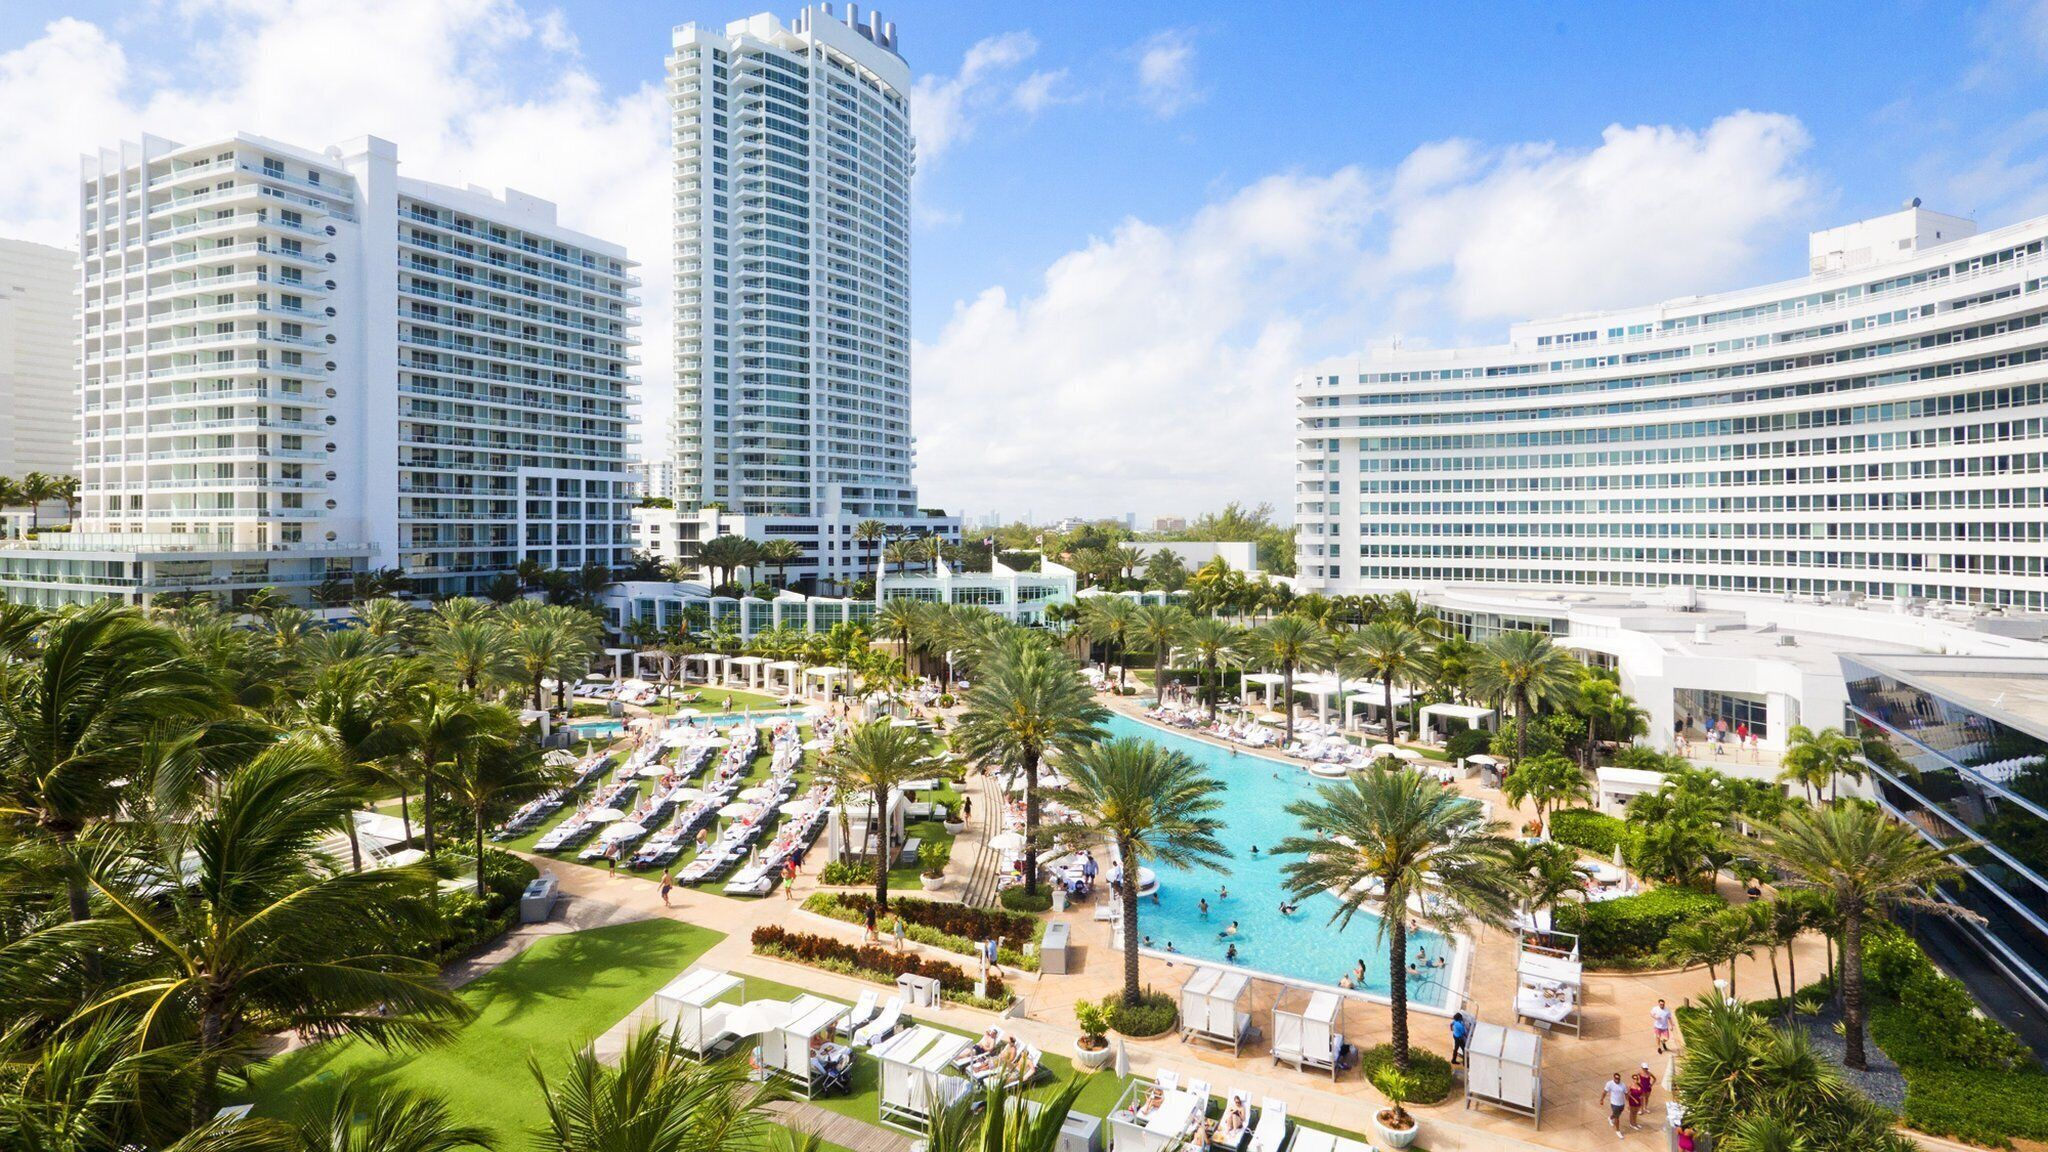 Courtesy of Fontainebleau Miami Beach / Expedia